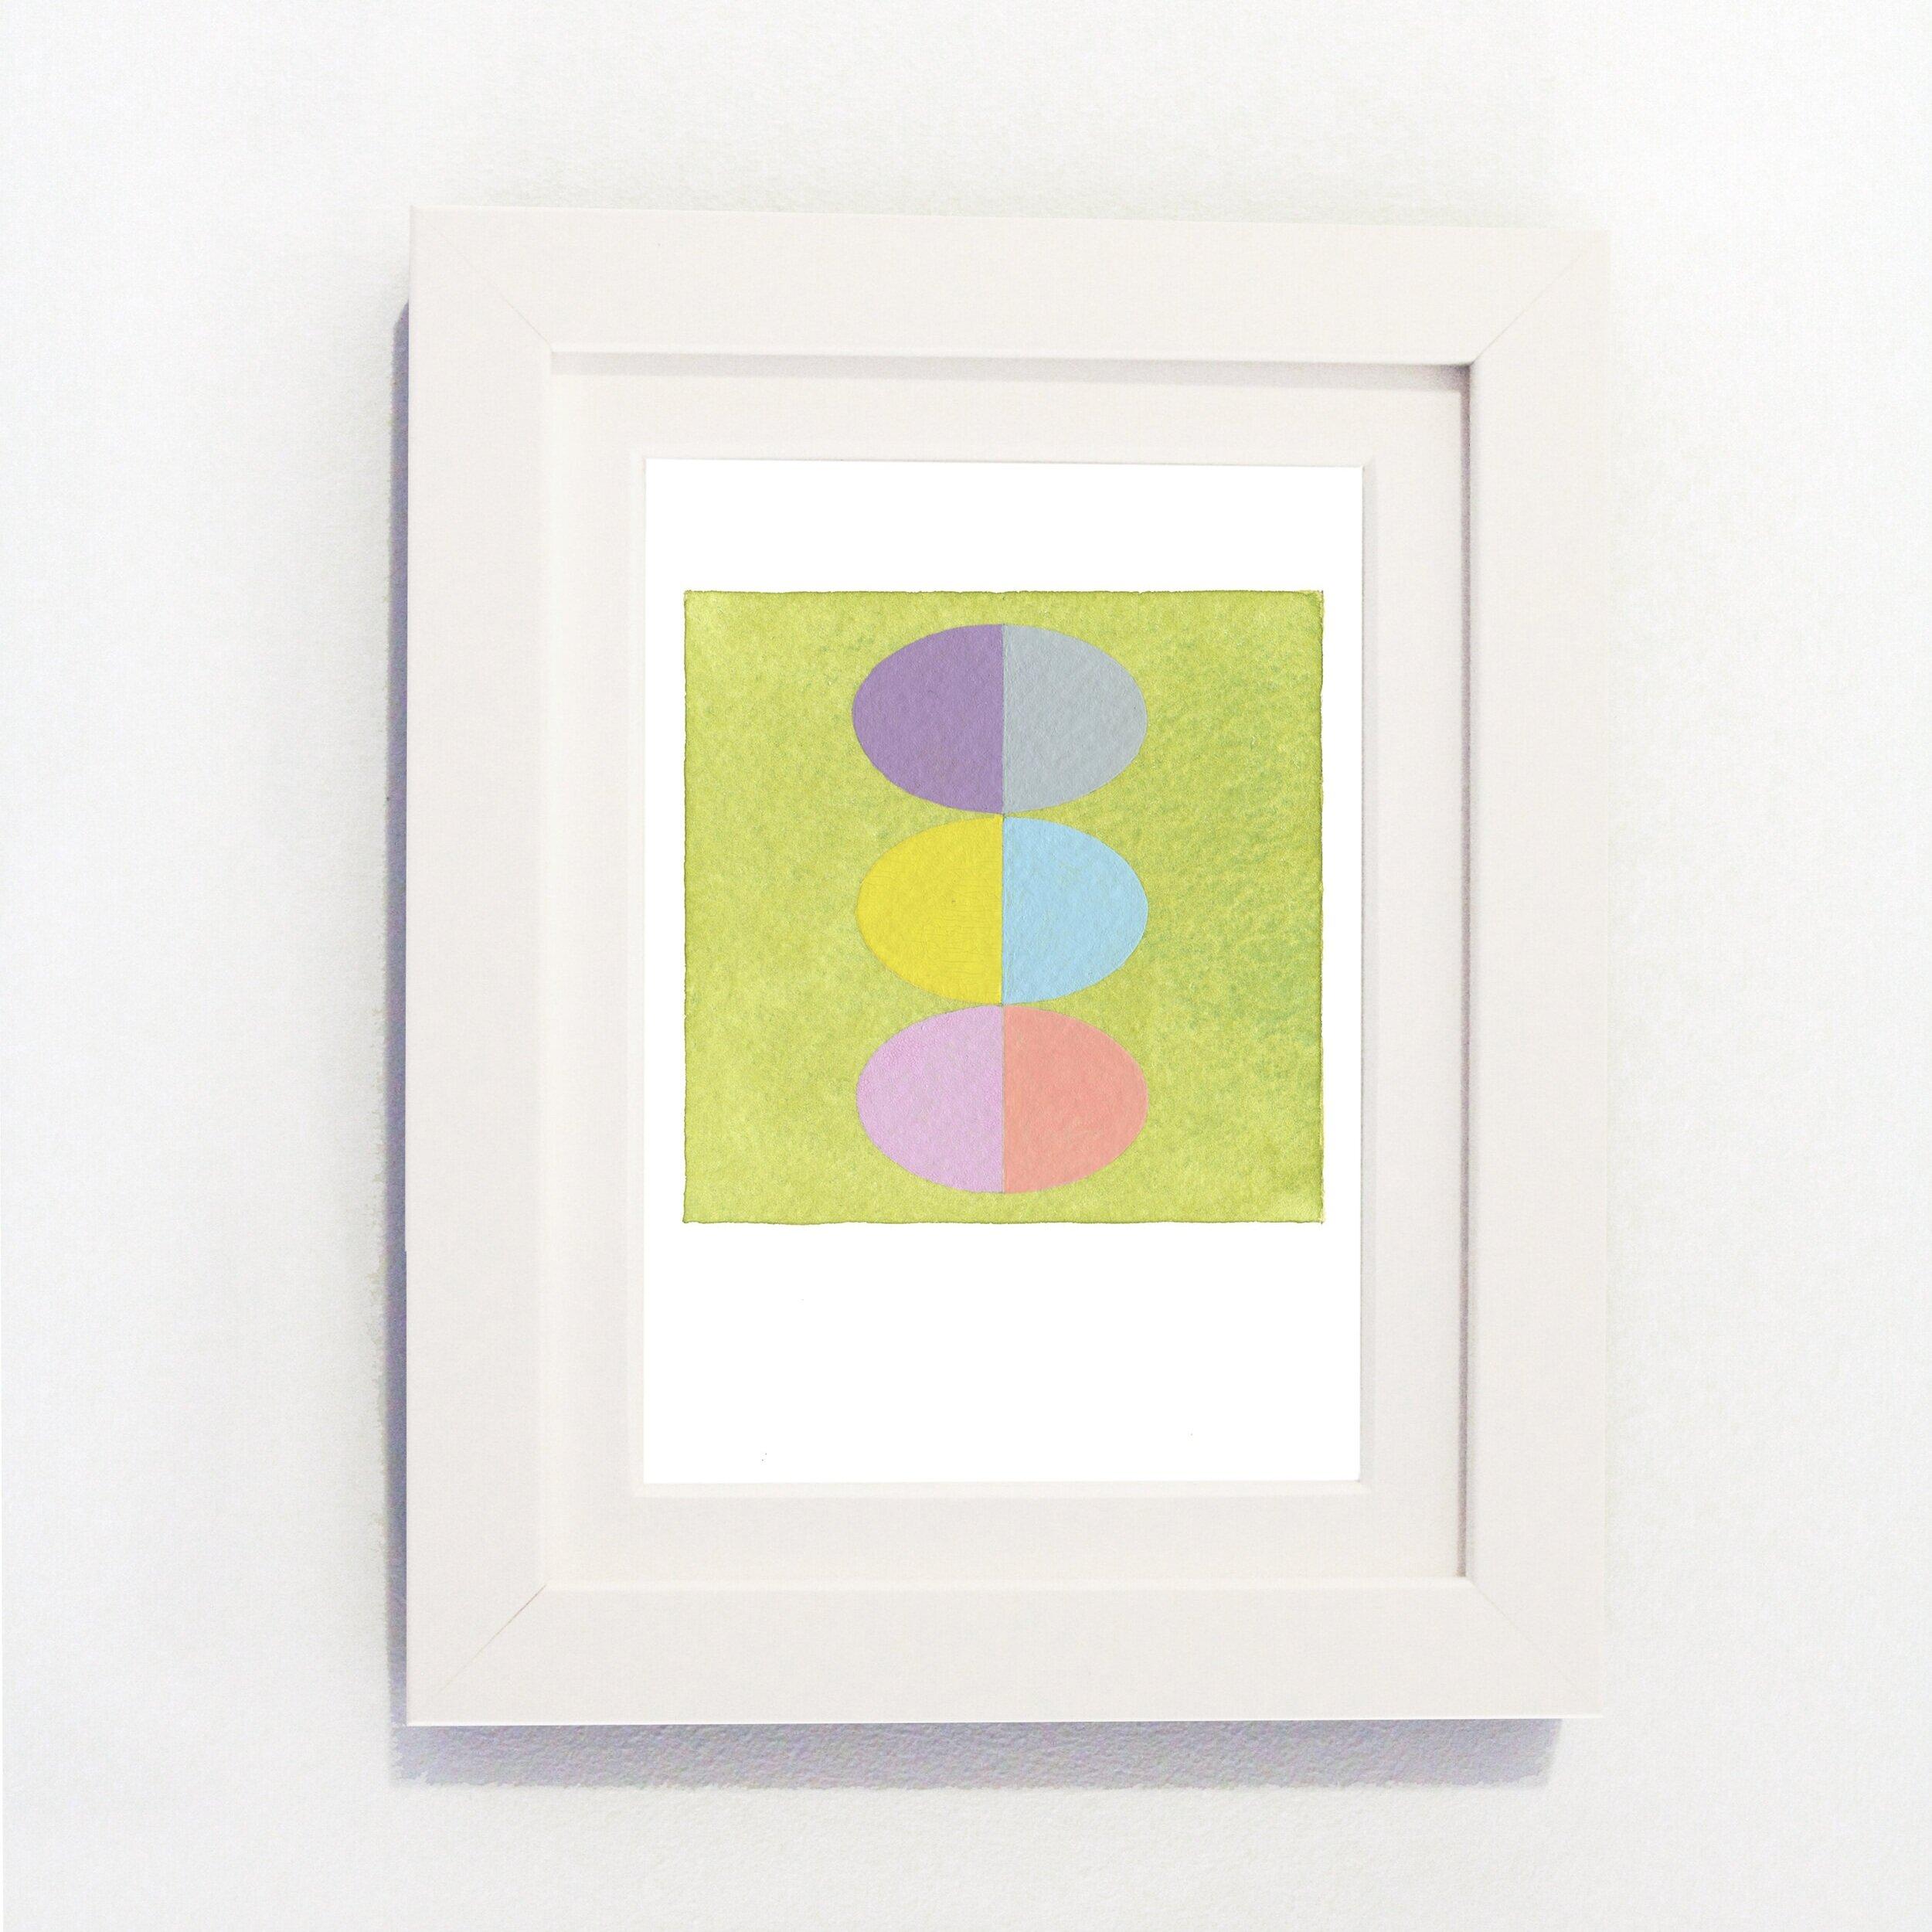 "Carol Robertson -  Alayrac Ellipses #II    Fine Art Giclée print on Hahnemühle German Etching  107mm x 152mm / 4"" x 6""  Limited Edition of 100"